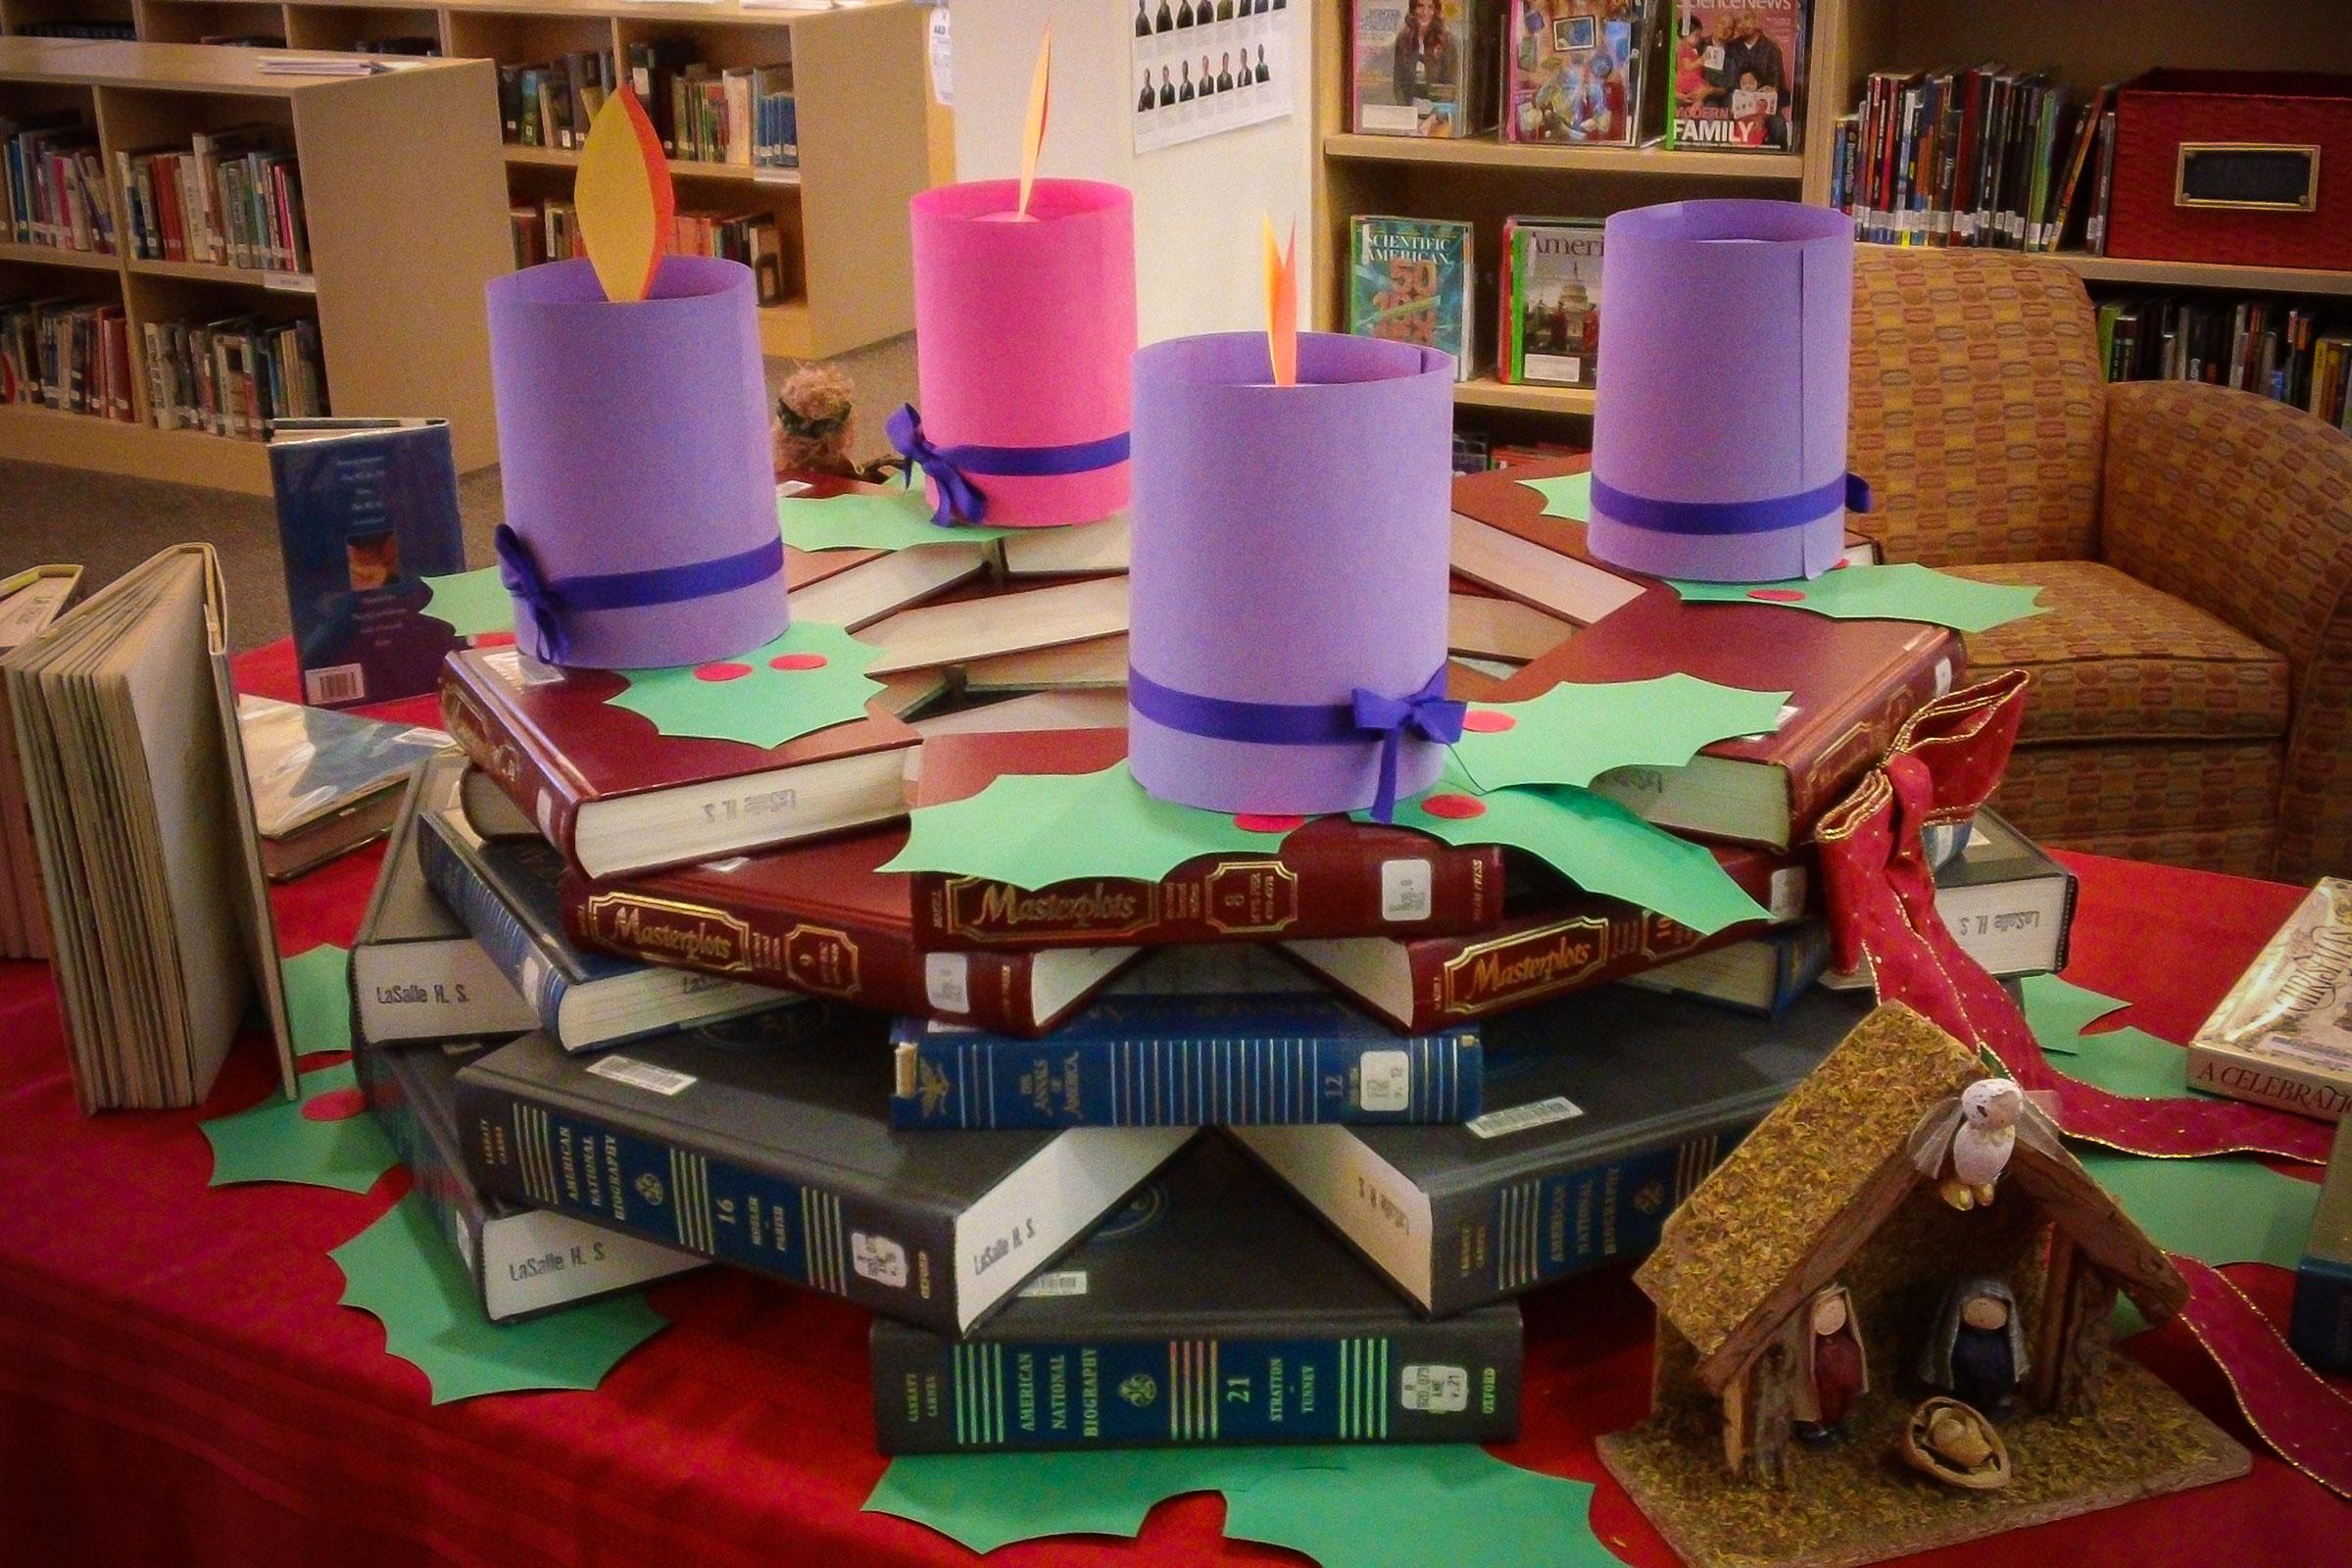 web-book-advent-wreath-colette-cassinelli-cc